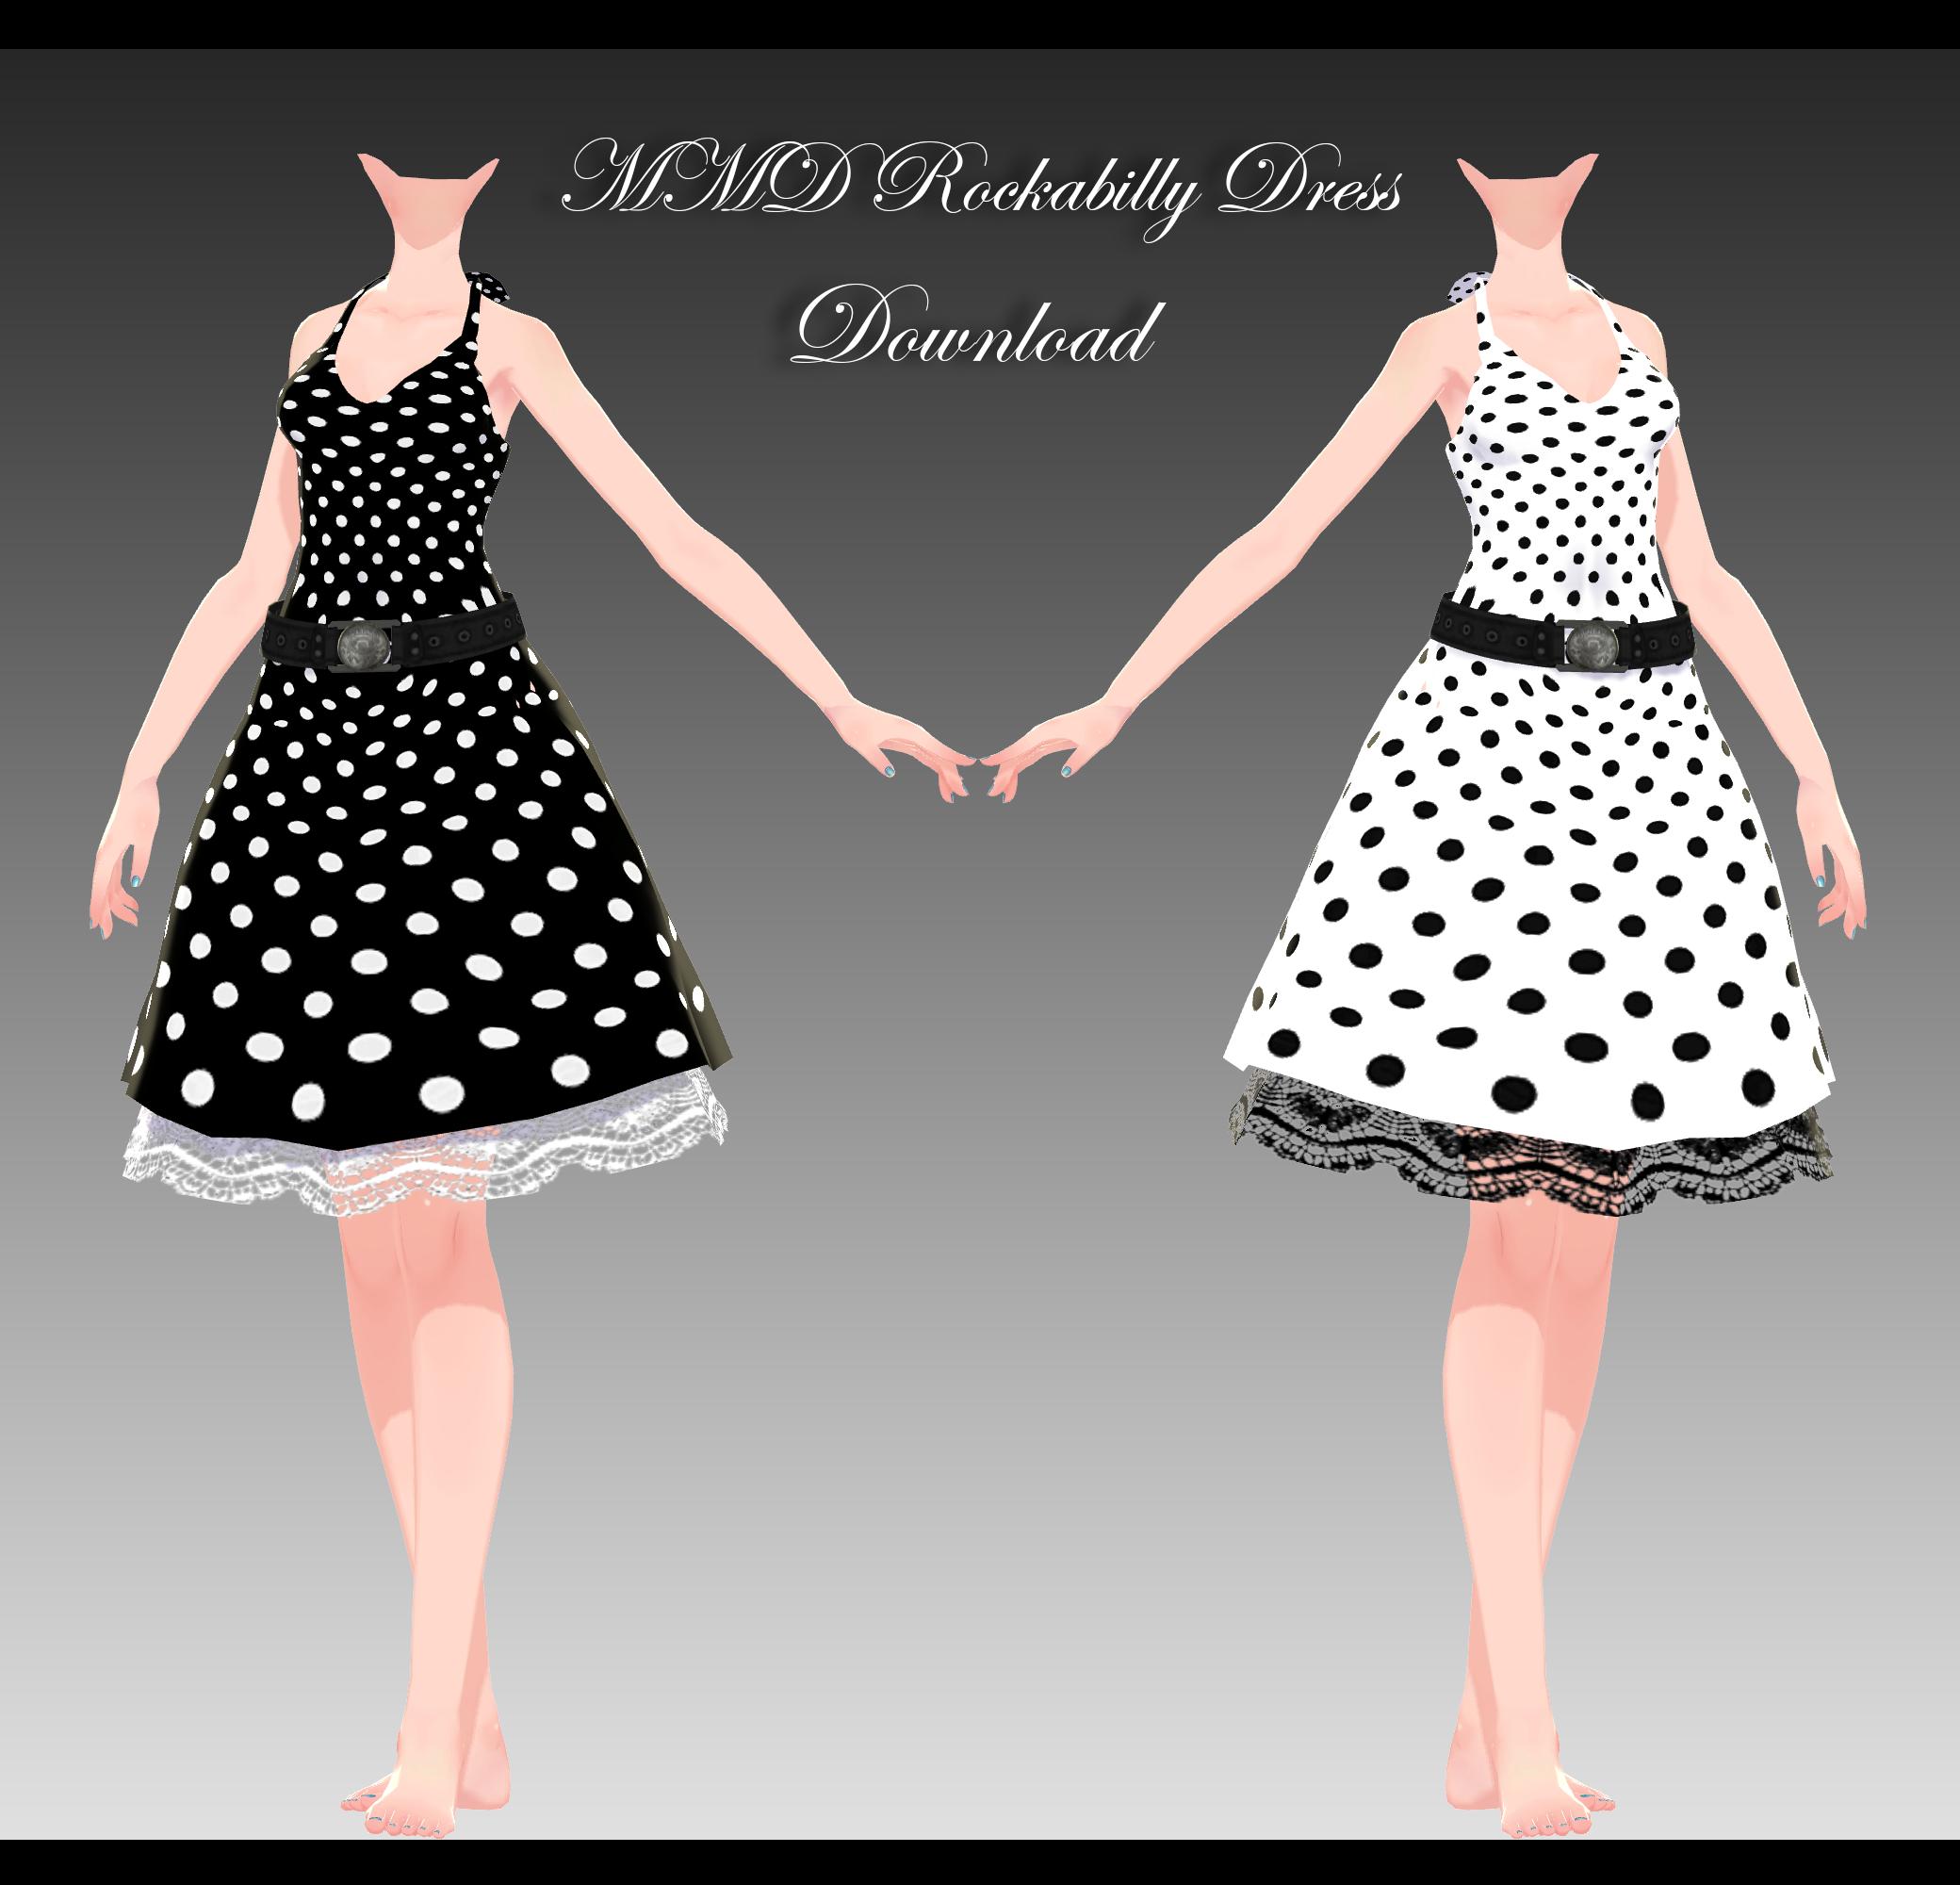 Mmd Rockabilly Dress By Xxxsickheartkunxxx On Deviantart